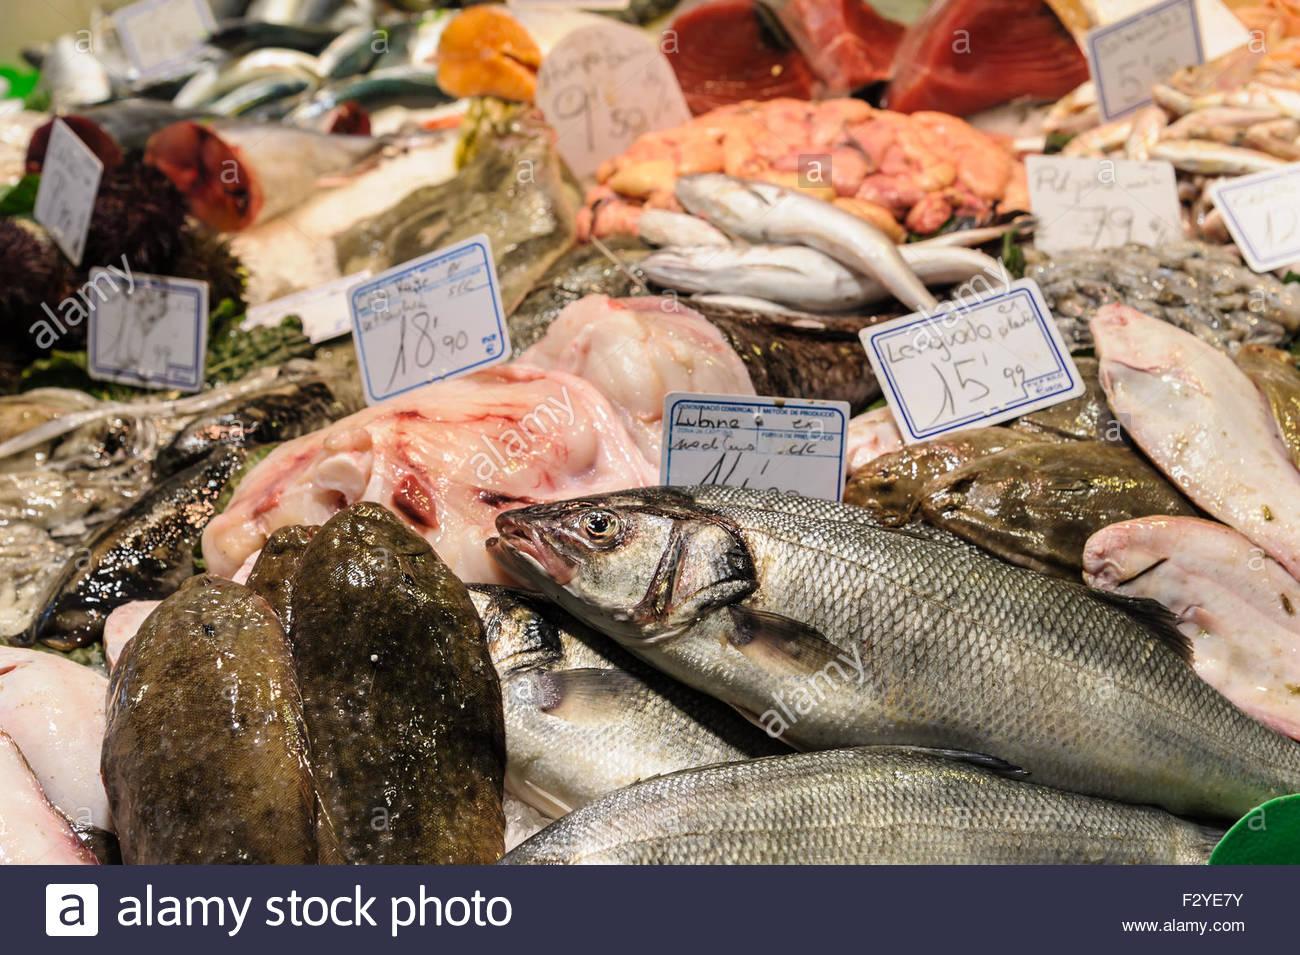 BARCELONA, SPAIN - MARCH 12, 2012: Fish and seafood on sale in Sant Josep de la Boqueria Market.  This market is - Stock Image